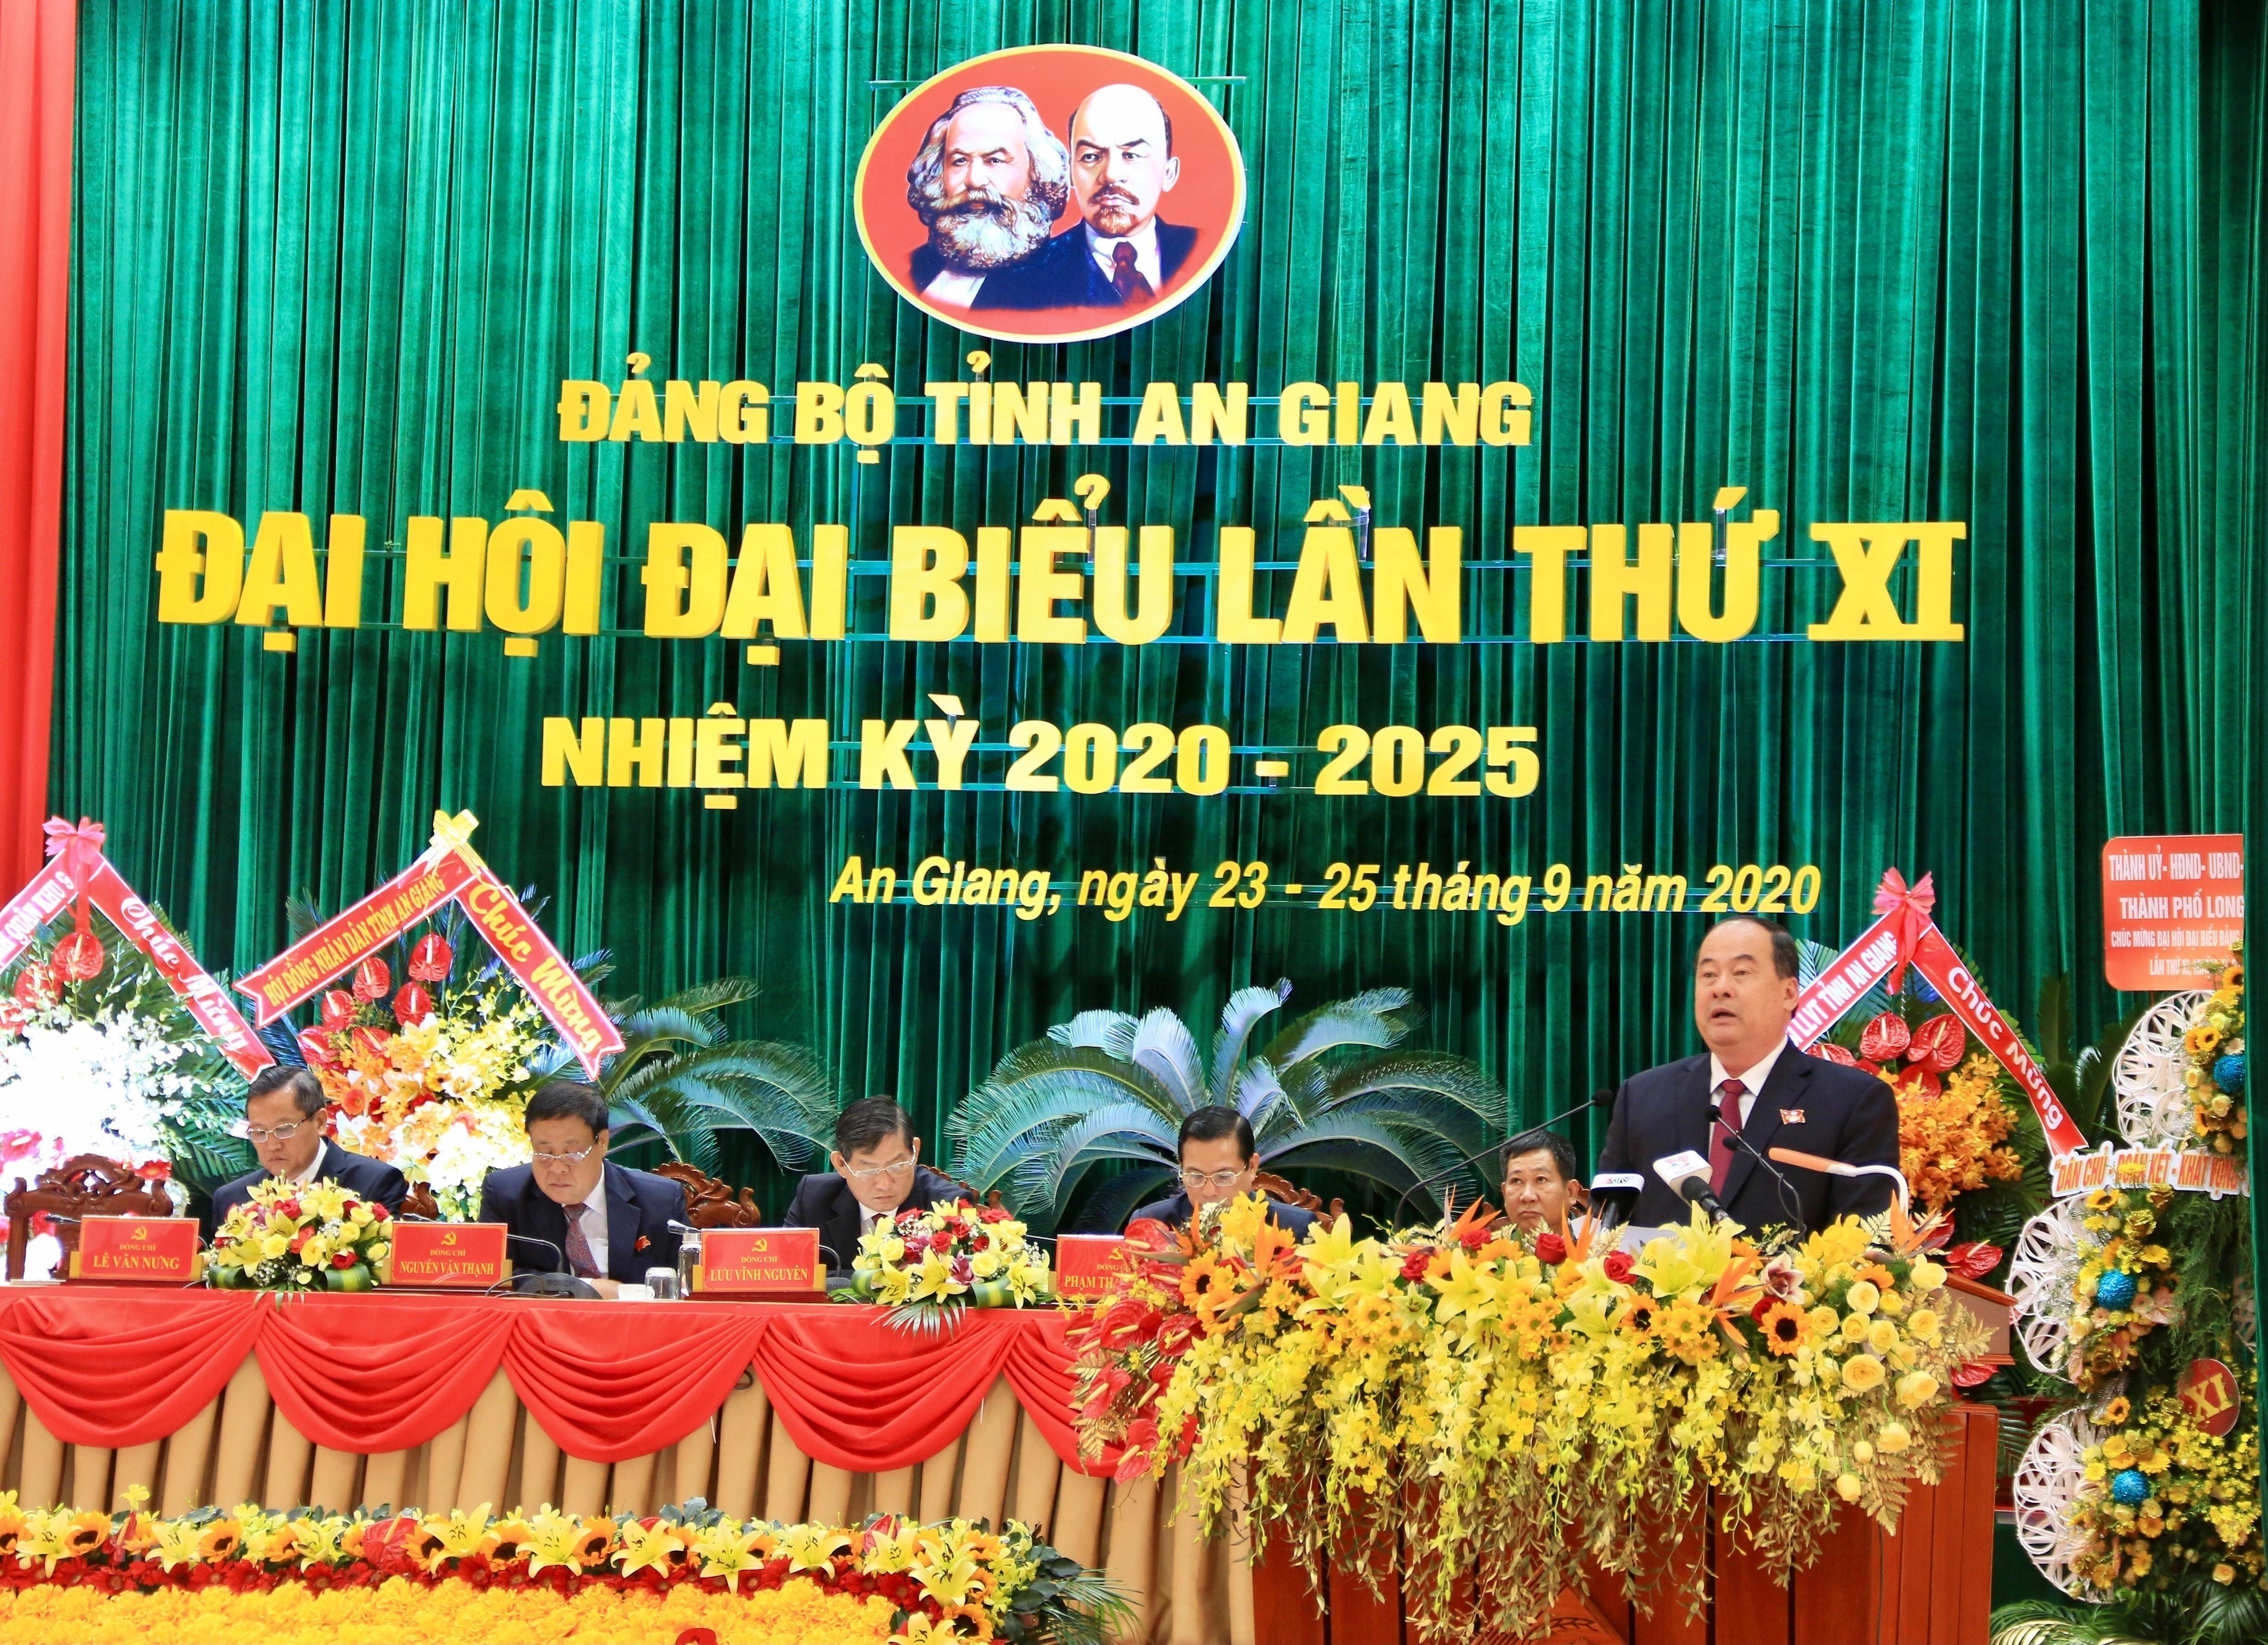 Dua An Giang thuoc nhom dau kinh te khu vuc DBSCL vao nam 2025 hinh anh 1